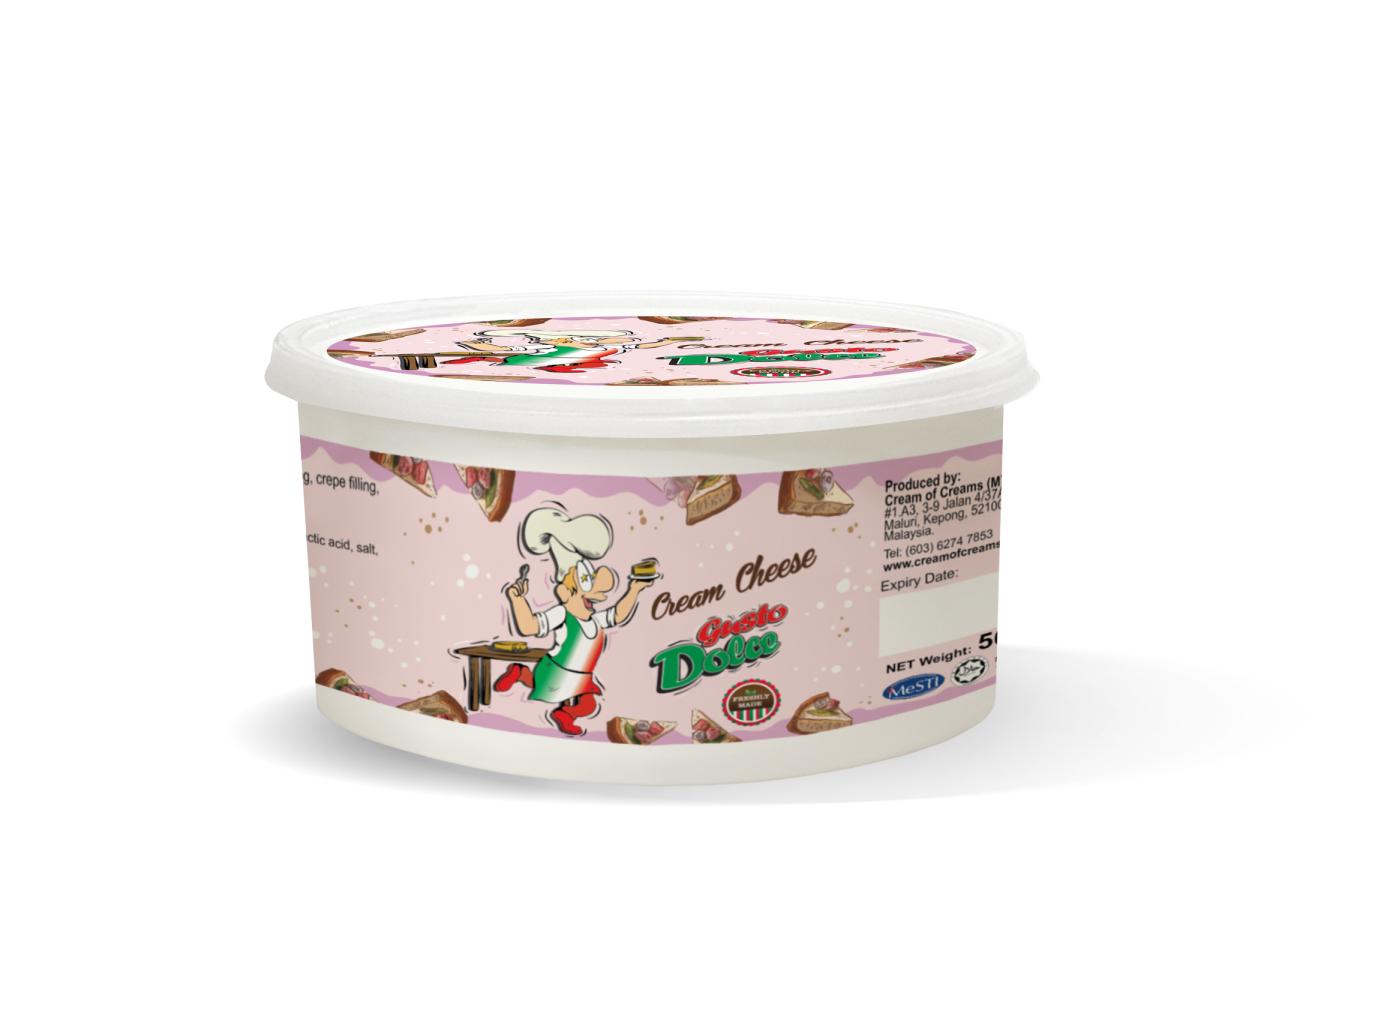 fresh cream cheese tub 500g pink packaging